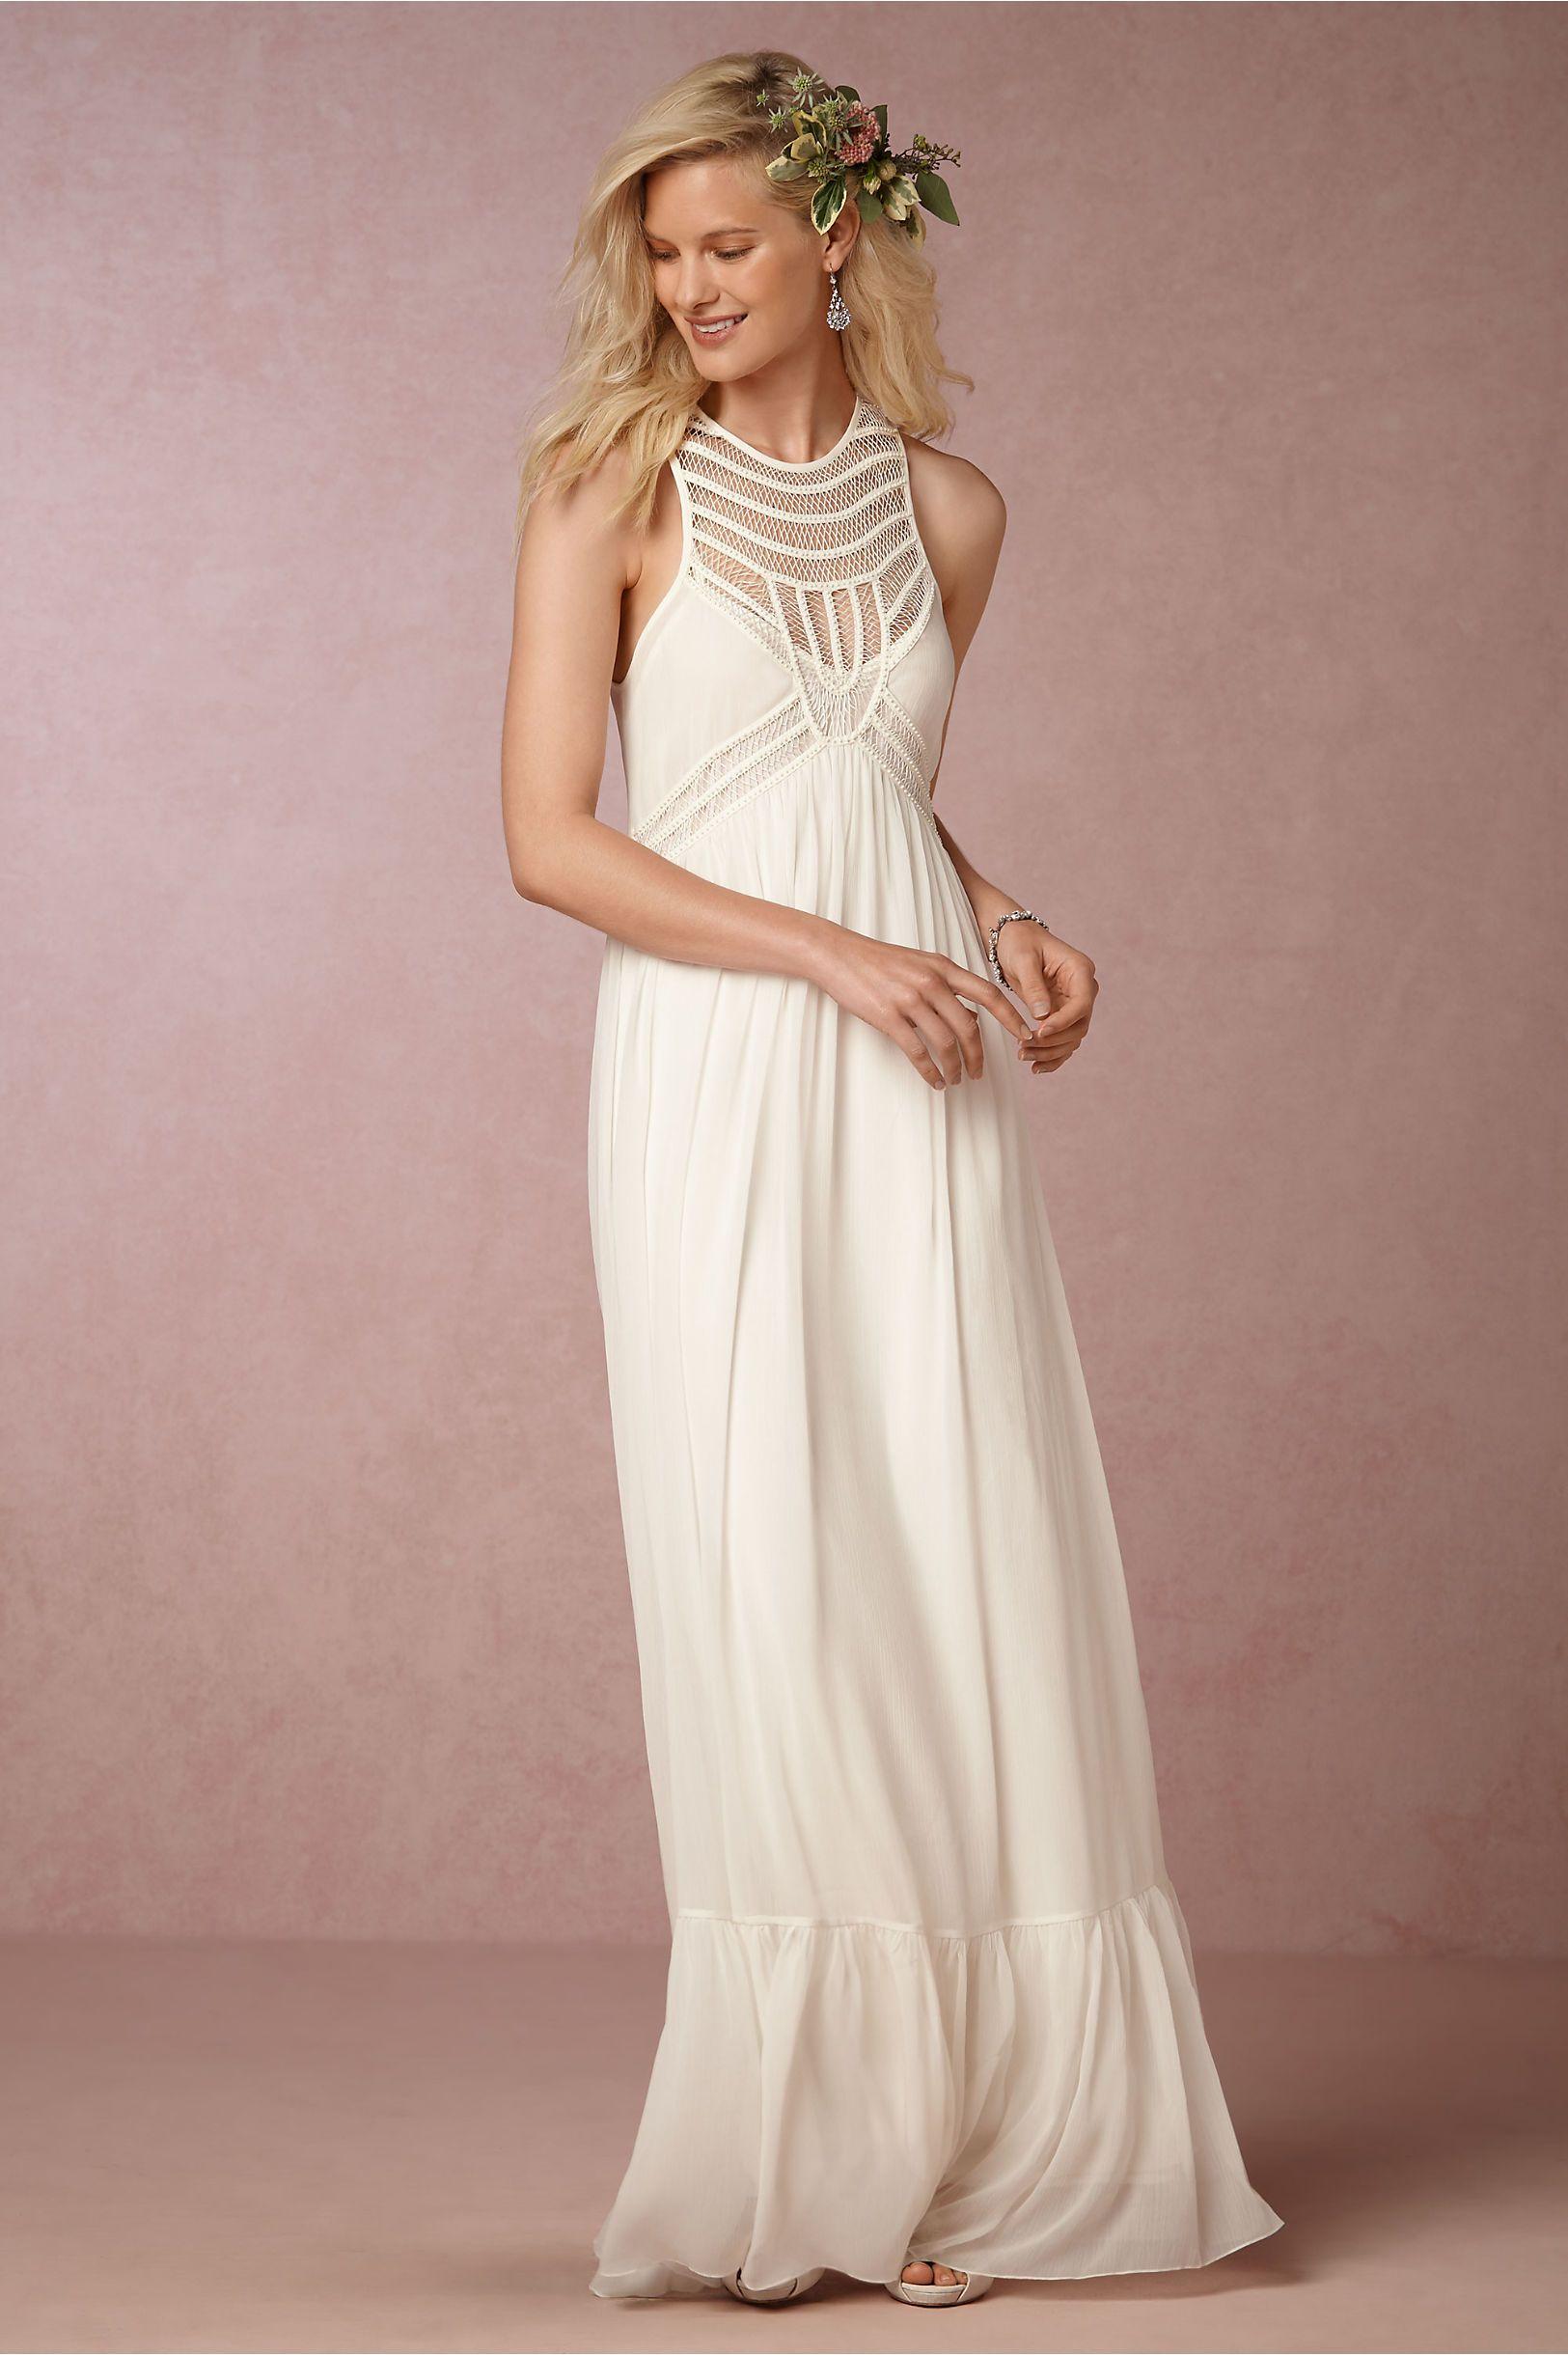 82b8eec16f BHLDN Jessalyn Dress in Beach & Honeymoon Dresses & Separates at ...